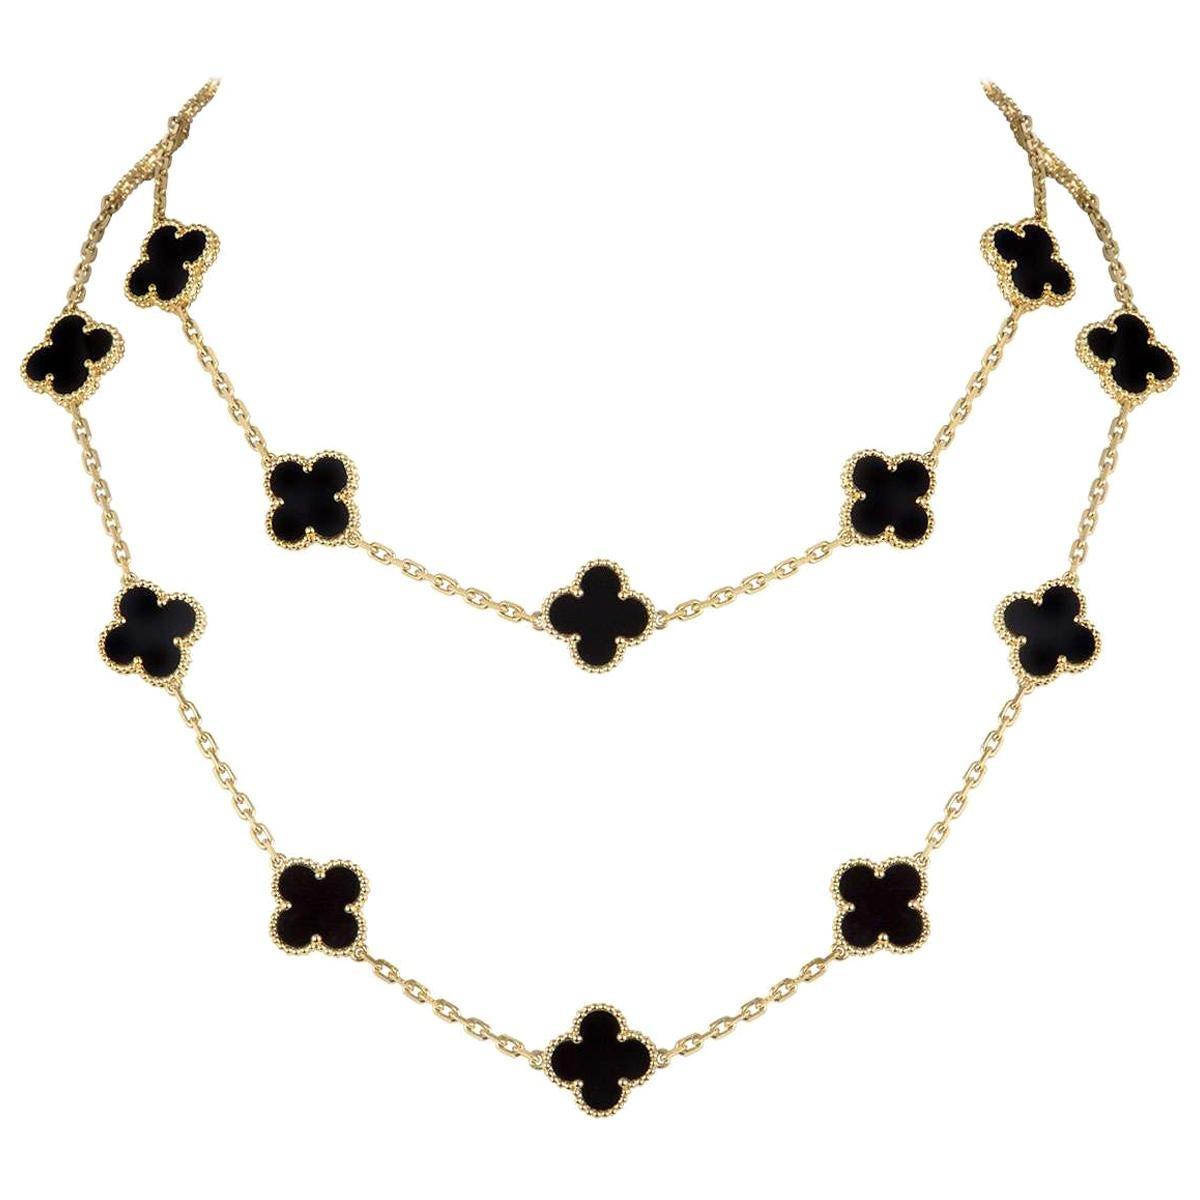 Van Cleef & Arpels Yellow Gold Vintage Alhambra Necklace VCARA43100